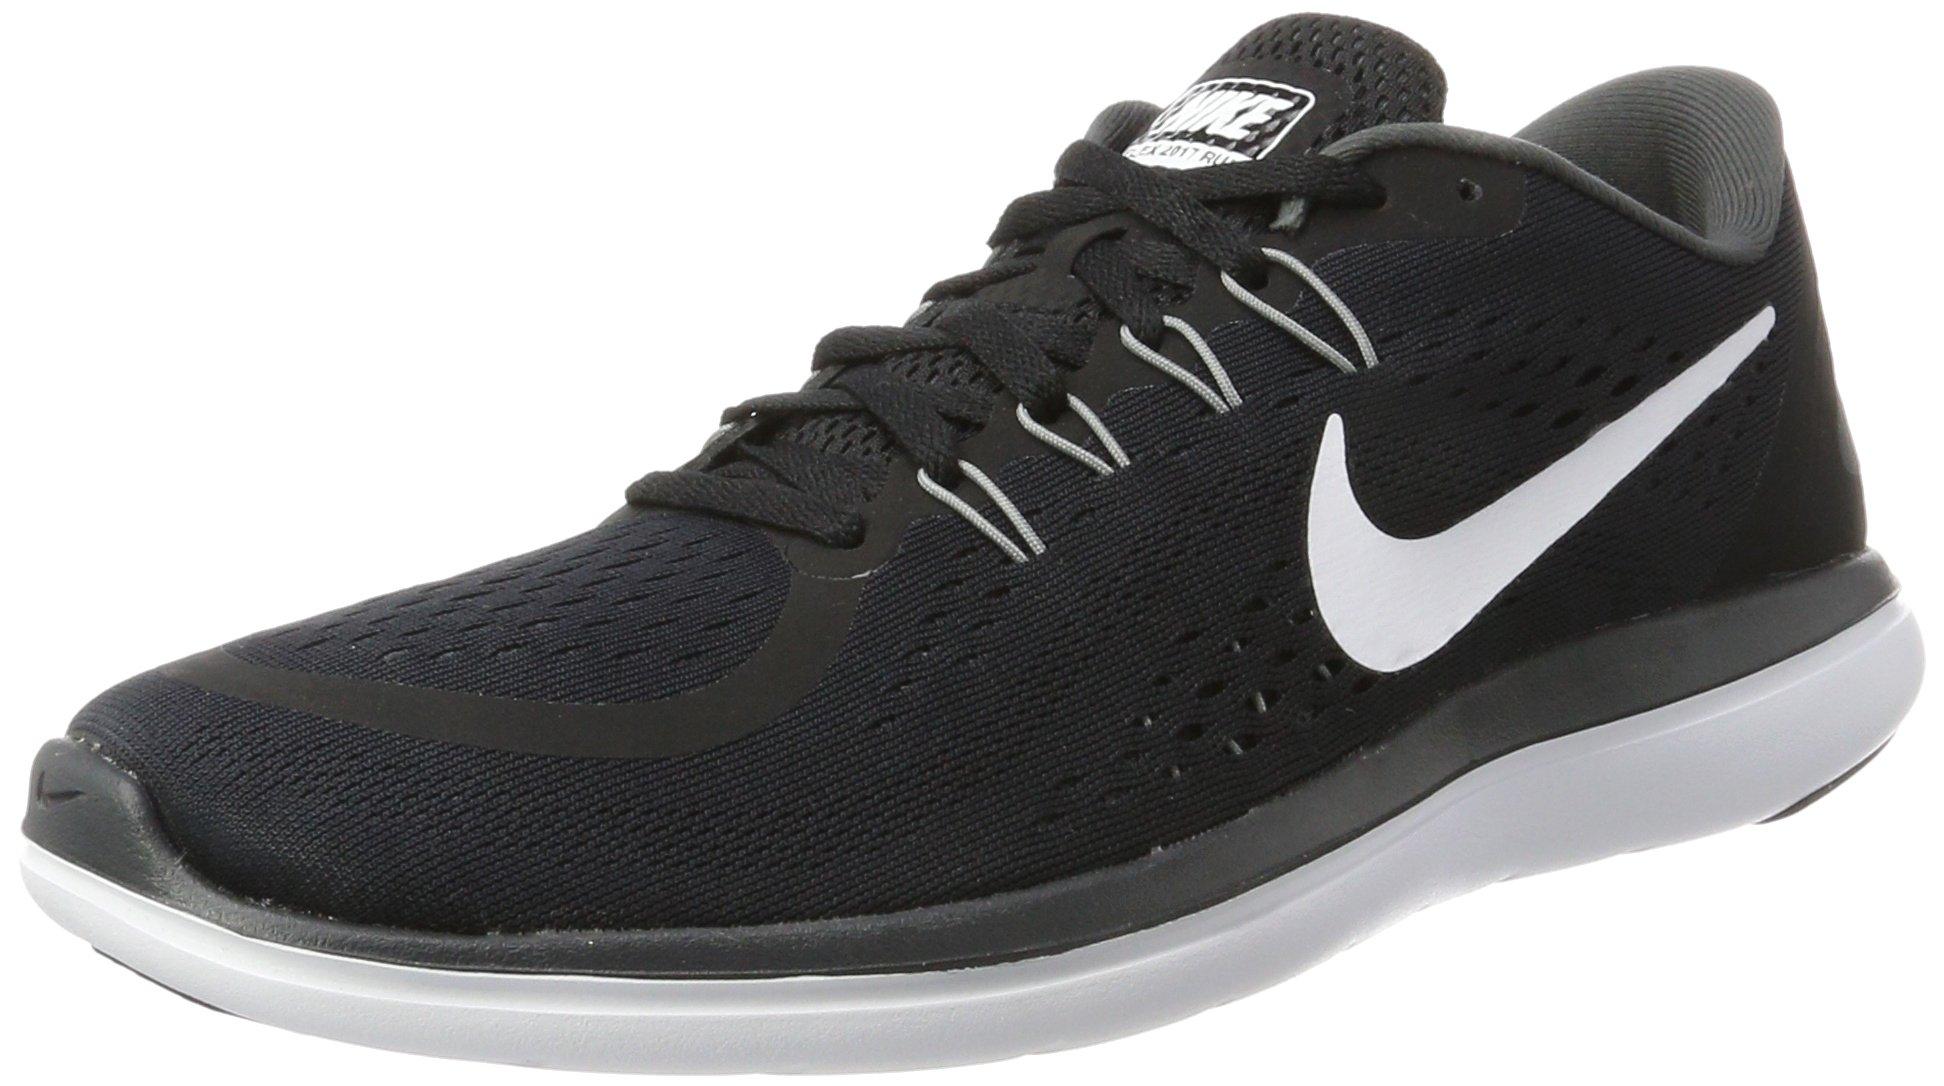 Nike Men's Flex 2017 RN Running Shoes Black/White/Anthracite/Cool Grey 10.5 D(M) US